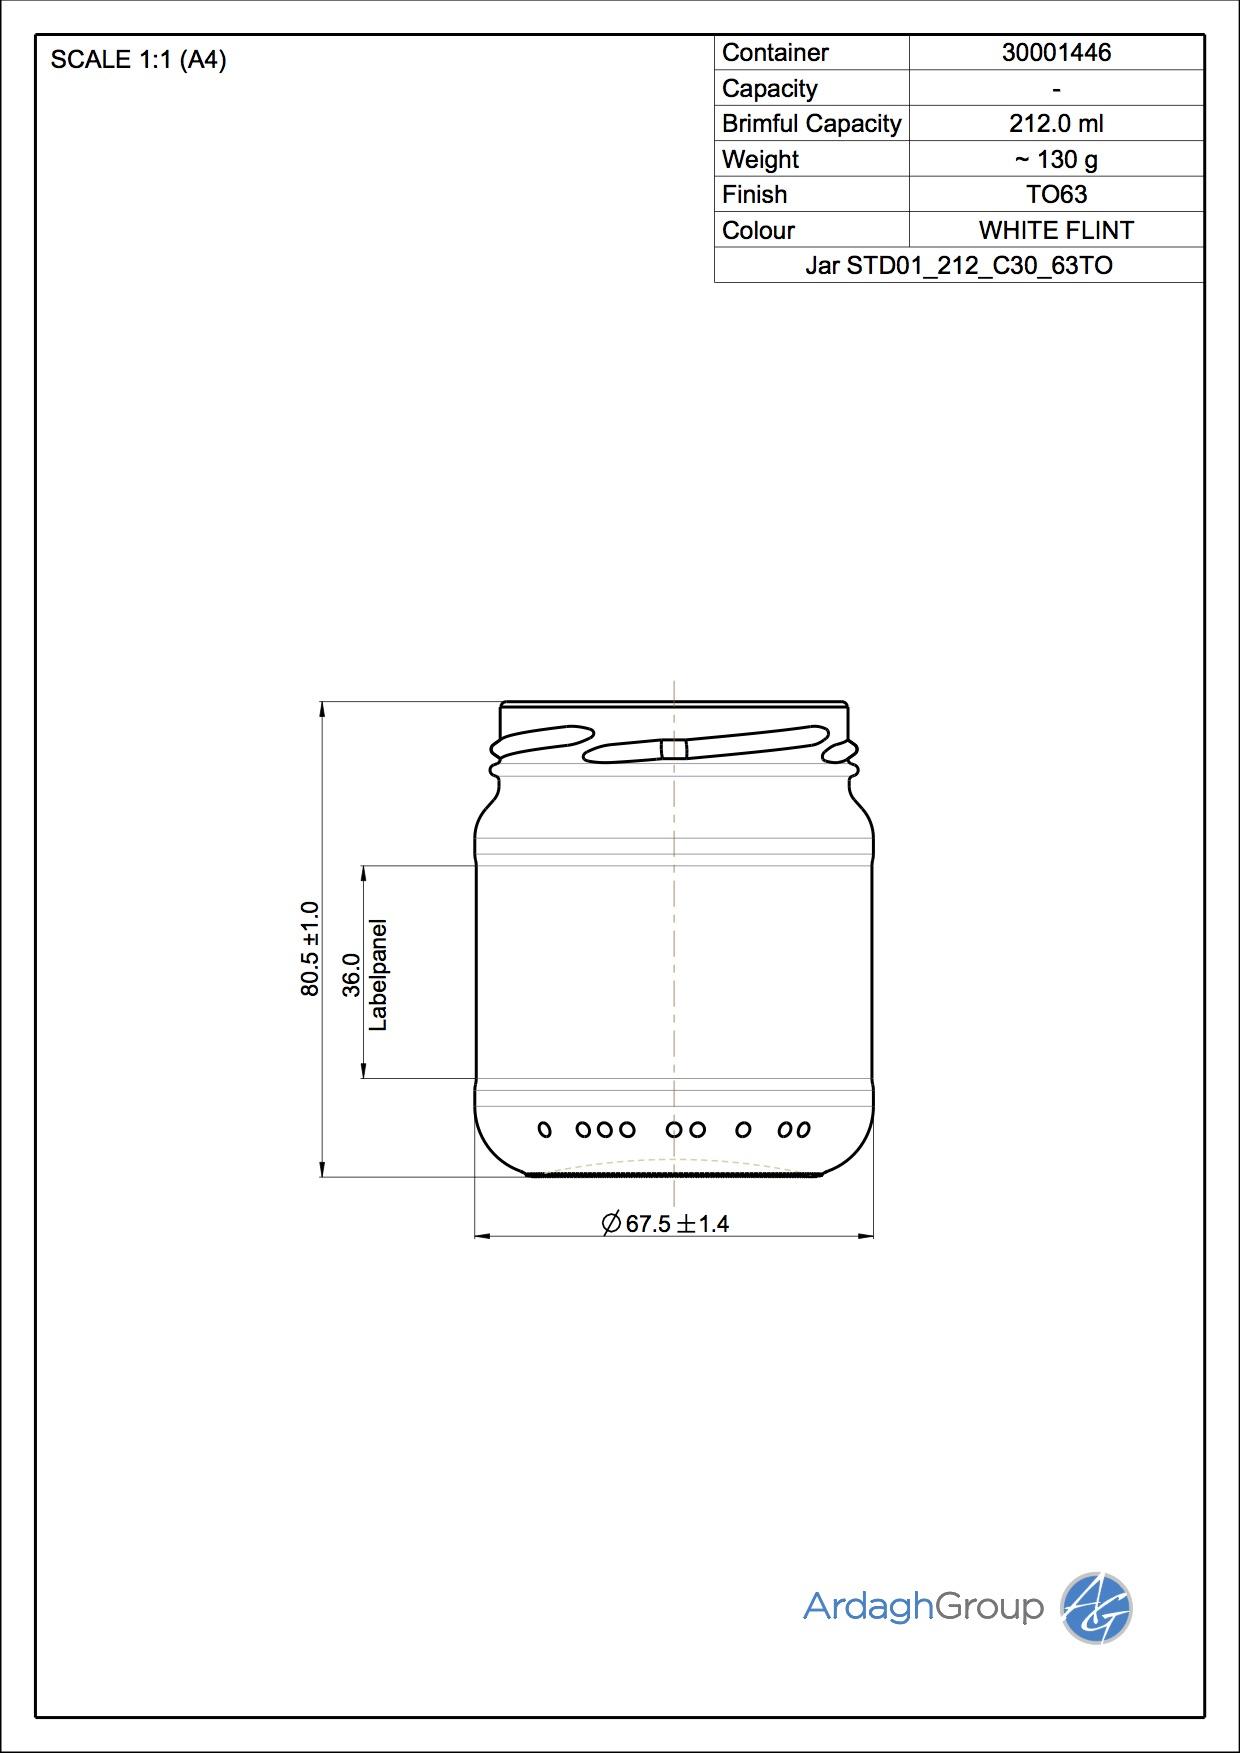 Jar STD01 212 C30 63TO